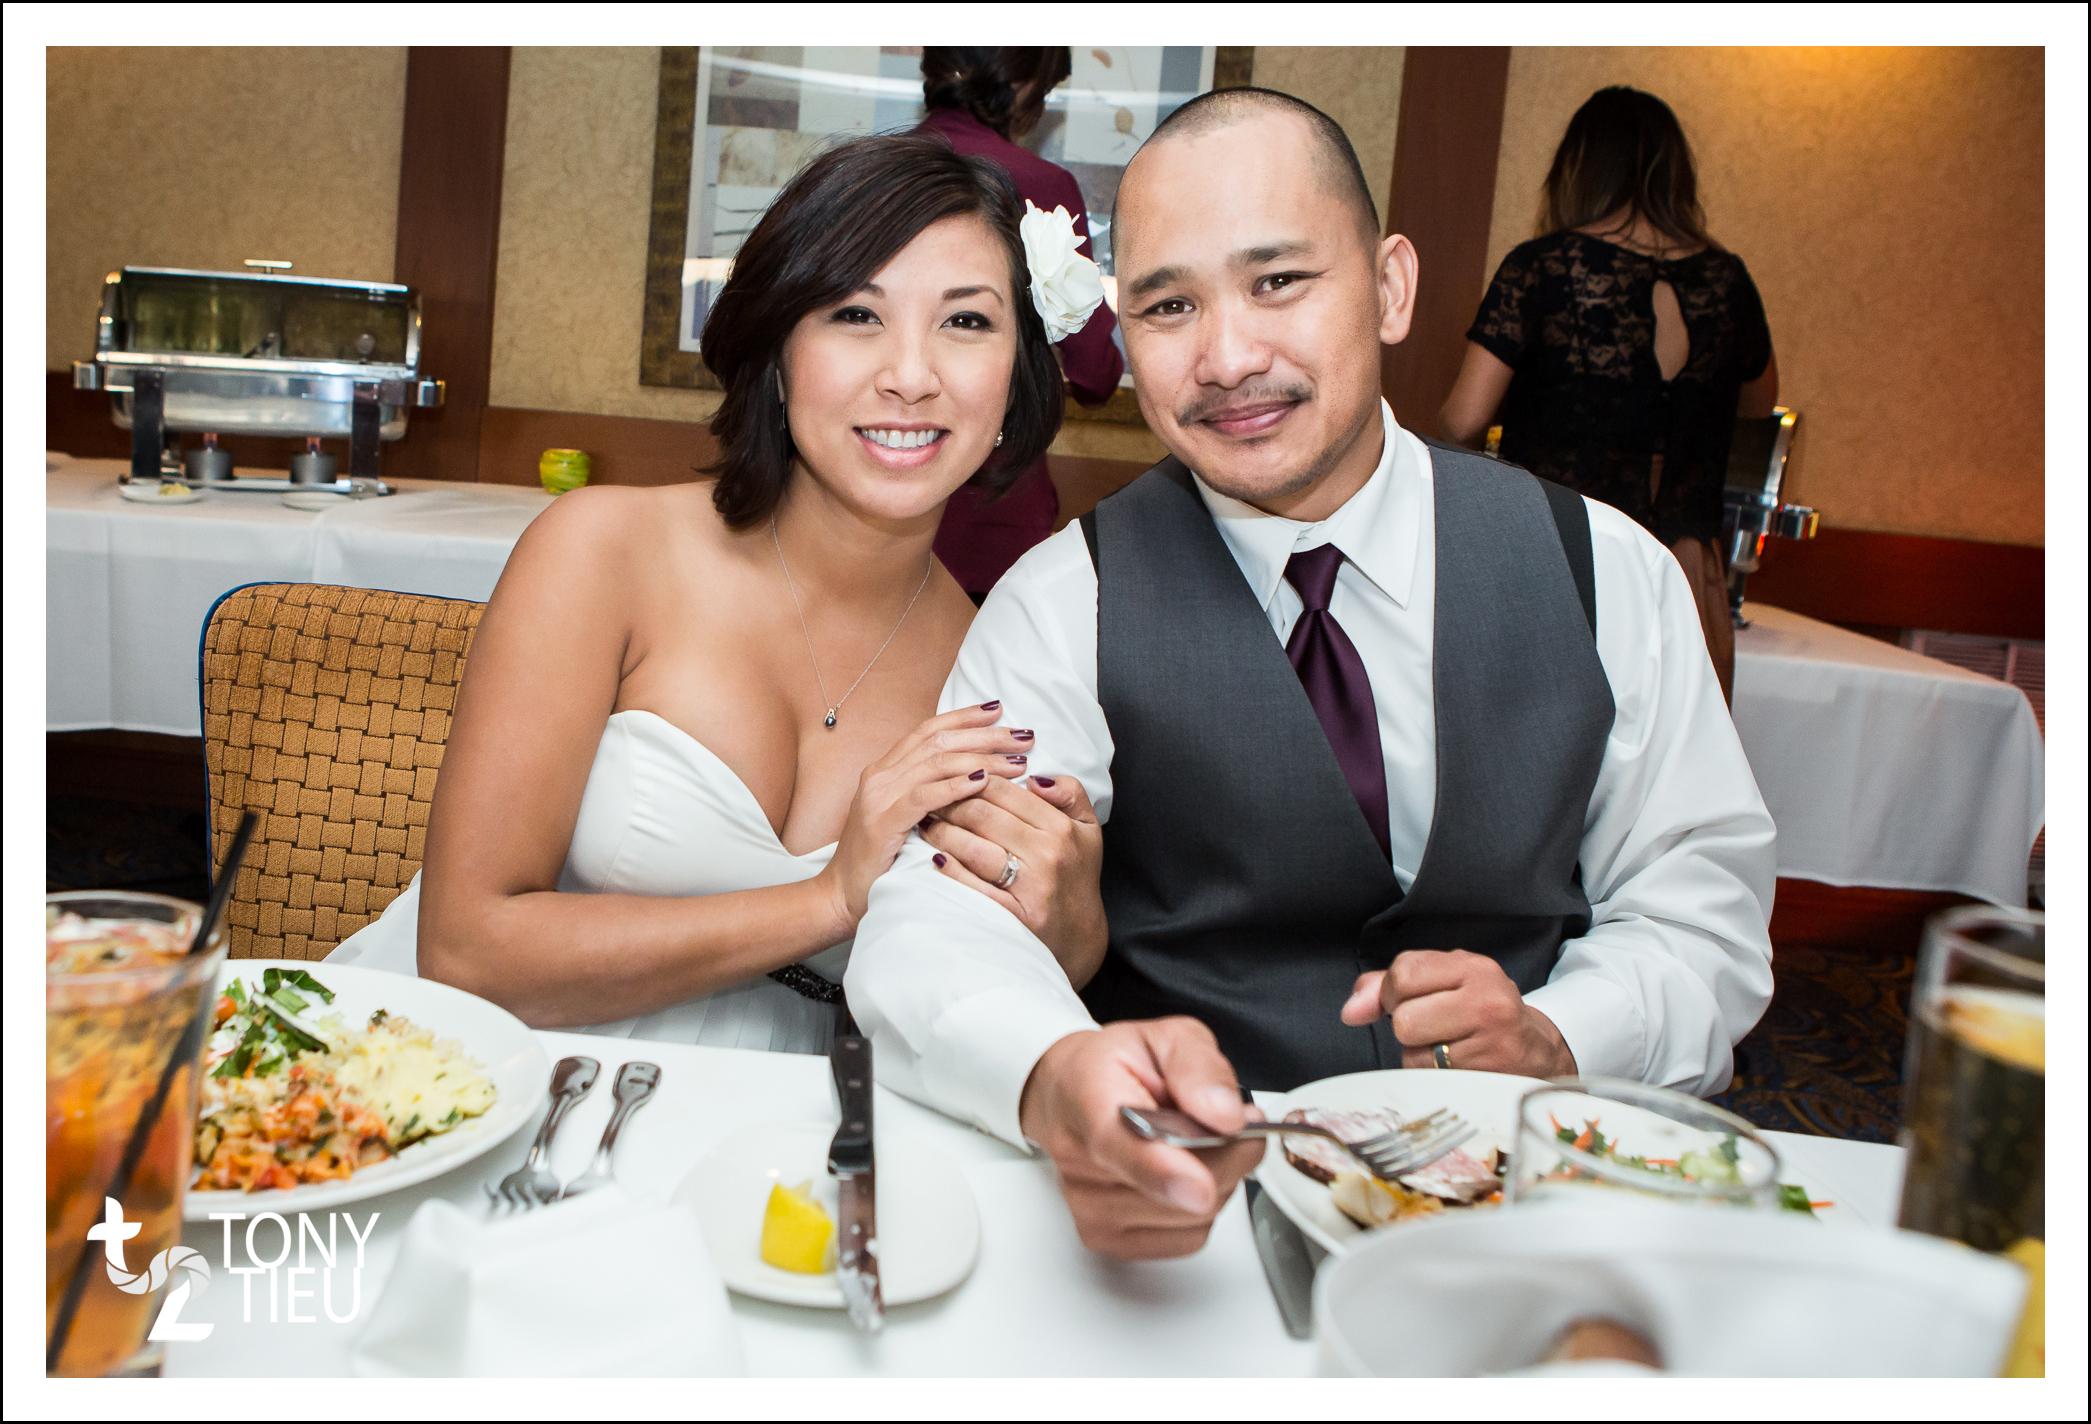 Tony_Tieu_Alyssa_ Wedding_10